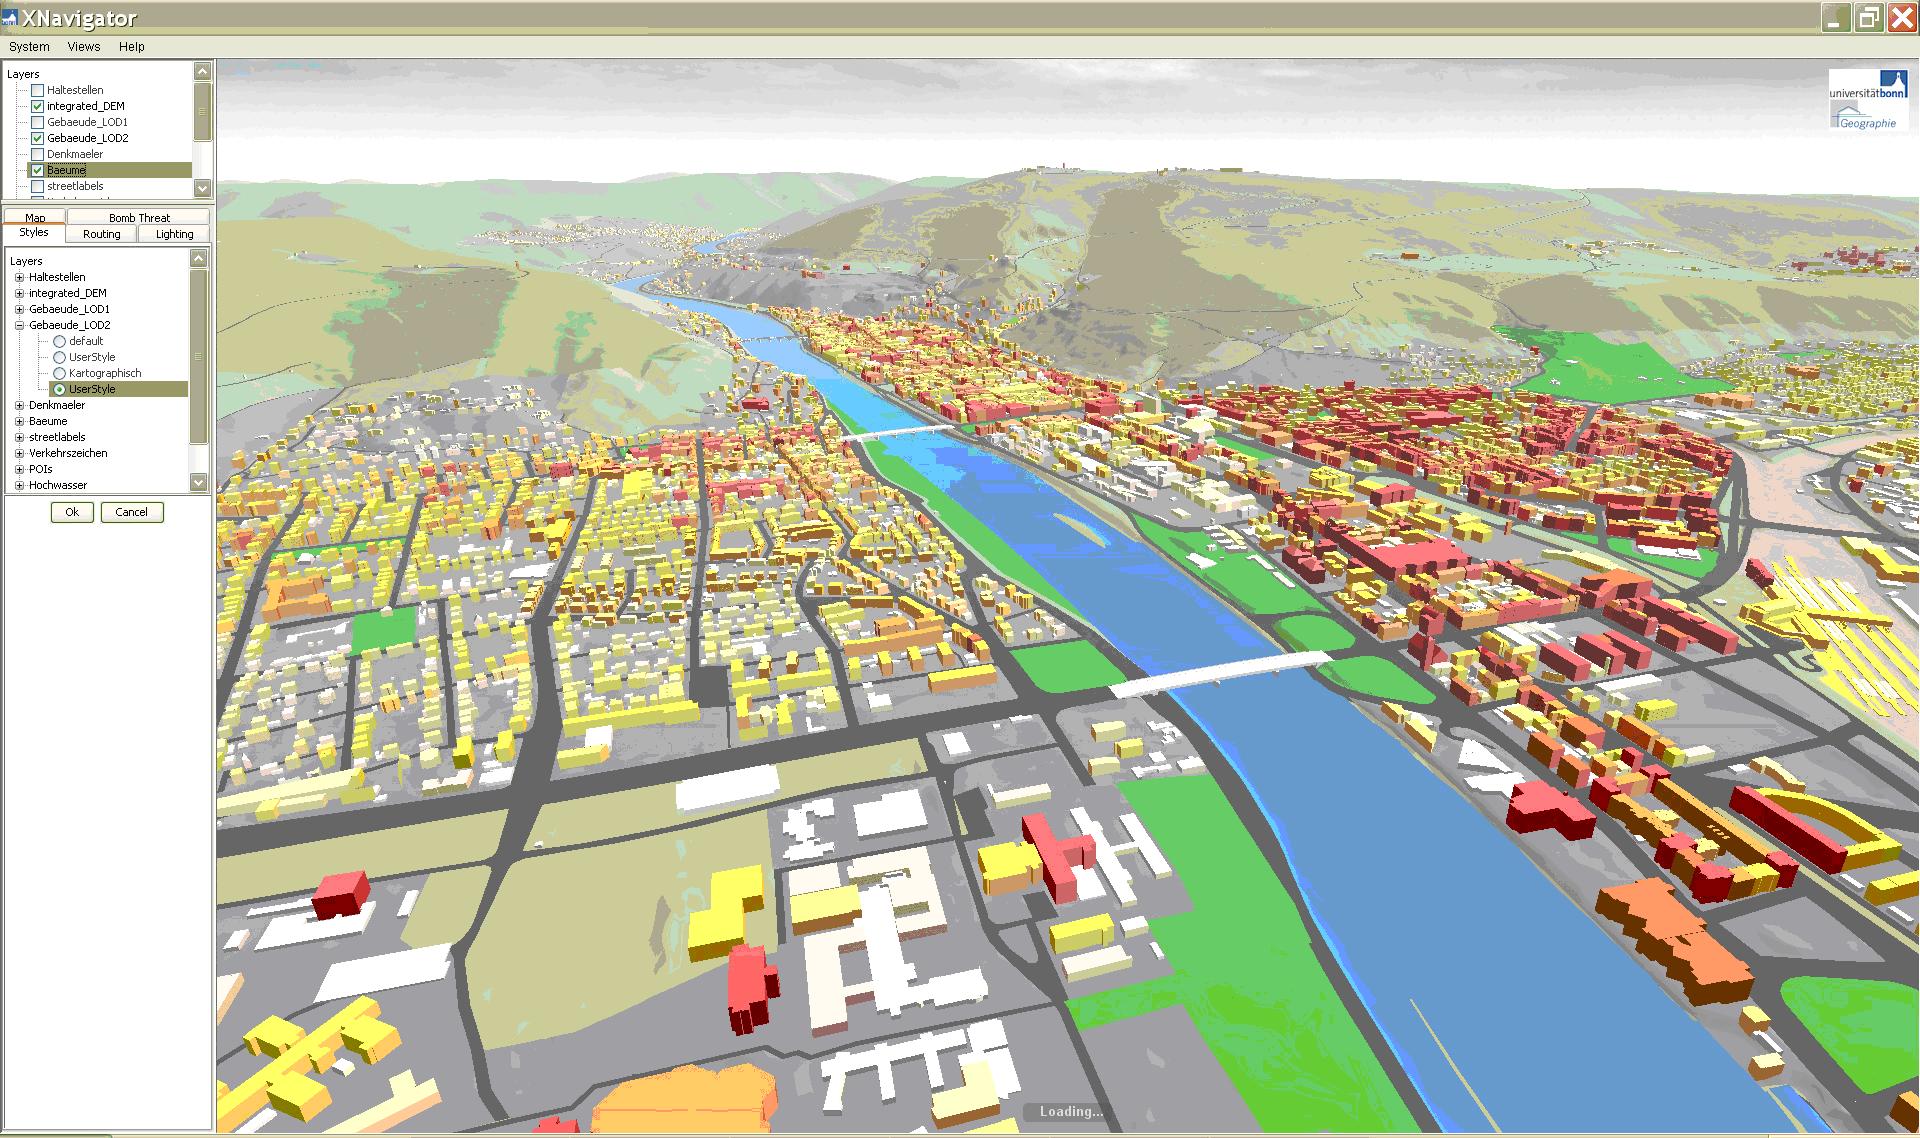 heidelberg 3d interactive 3d city mapping based on ogc standards gis lounge. Black Bedroom Furniture Sets. Home Design Ideas